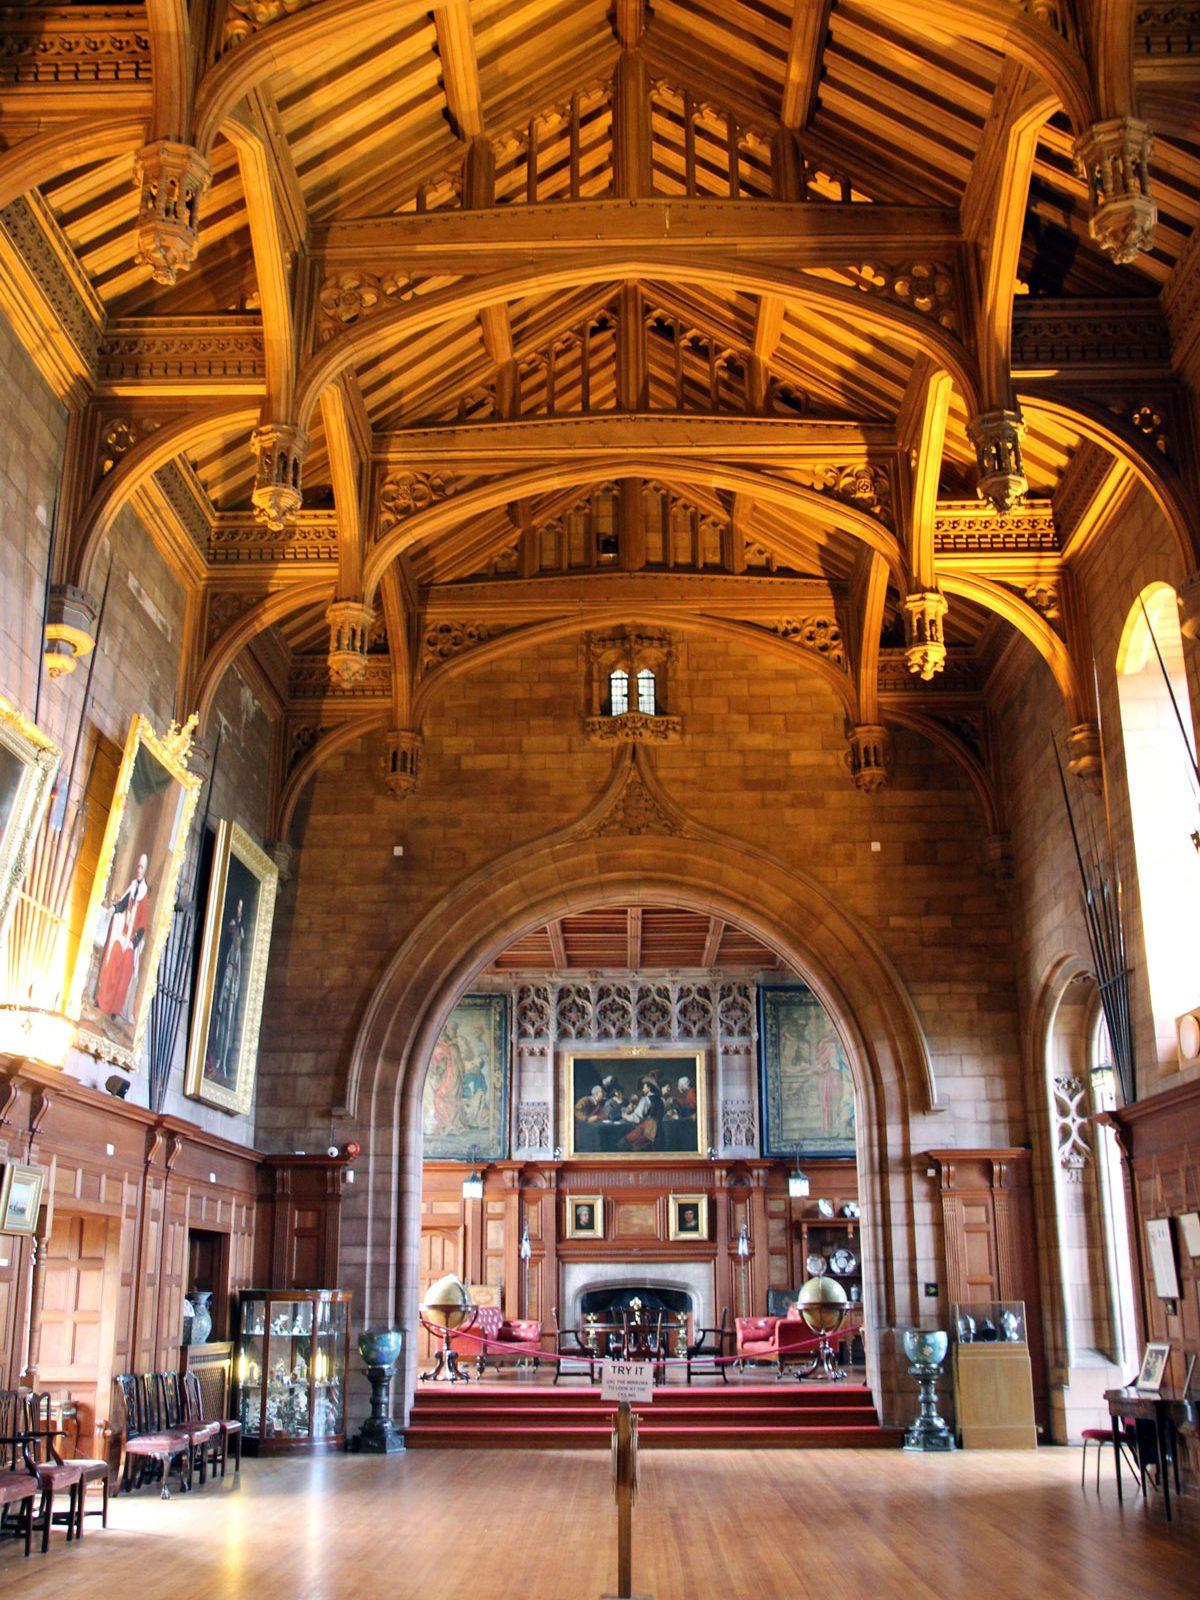 The King's Hall